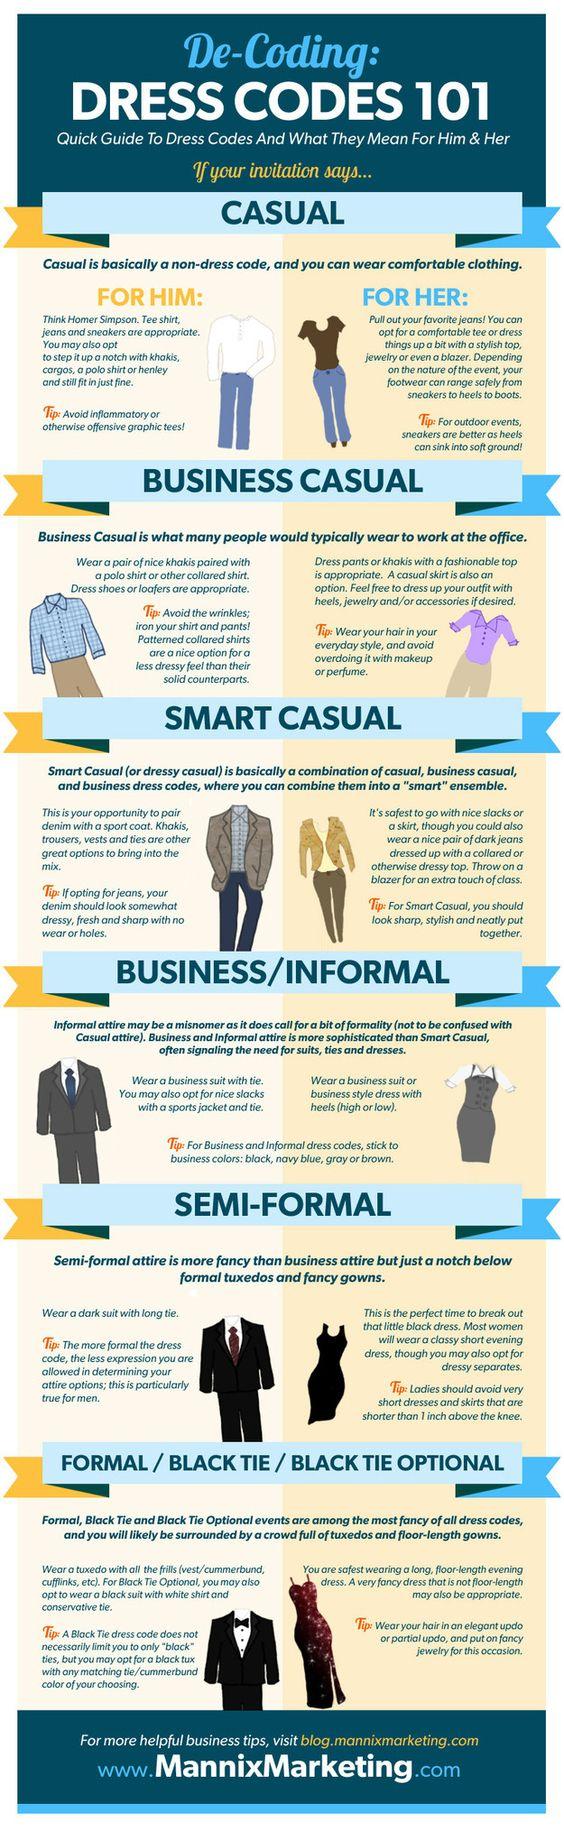 Dress codes.: